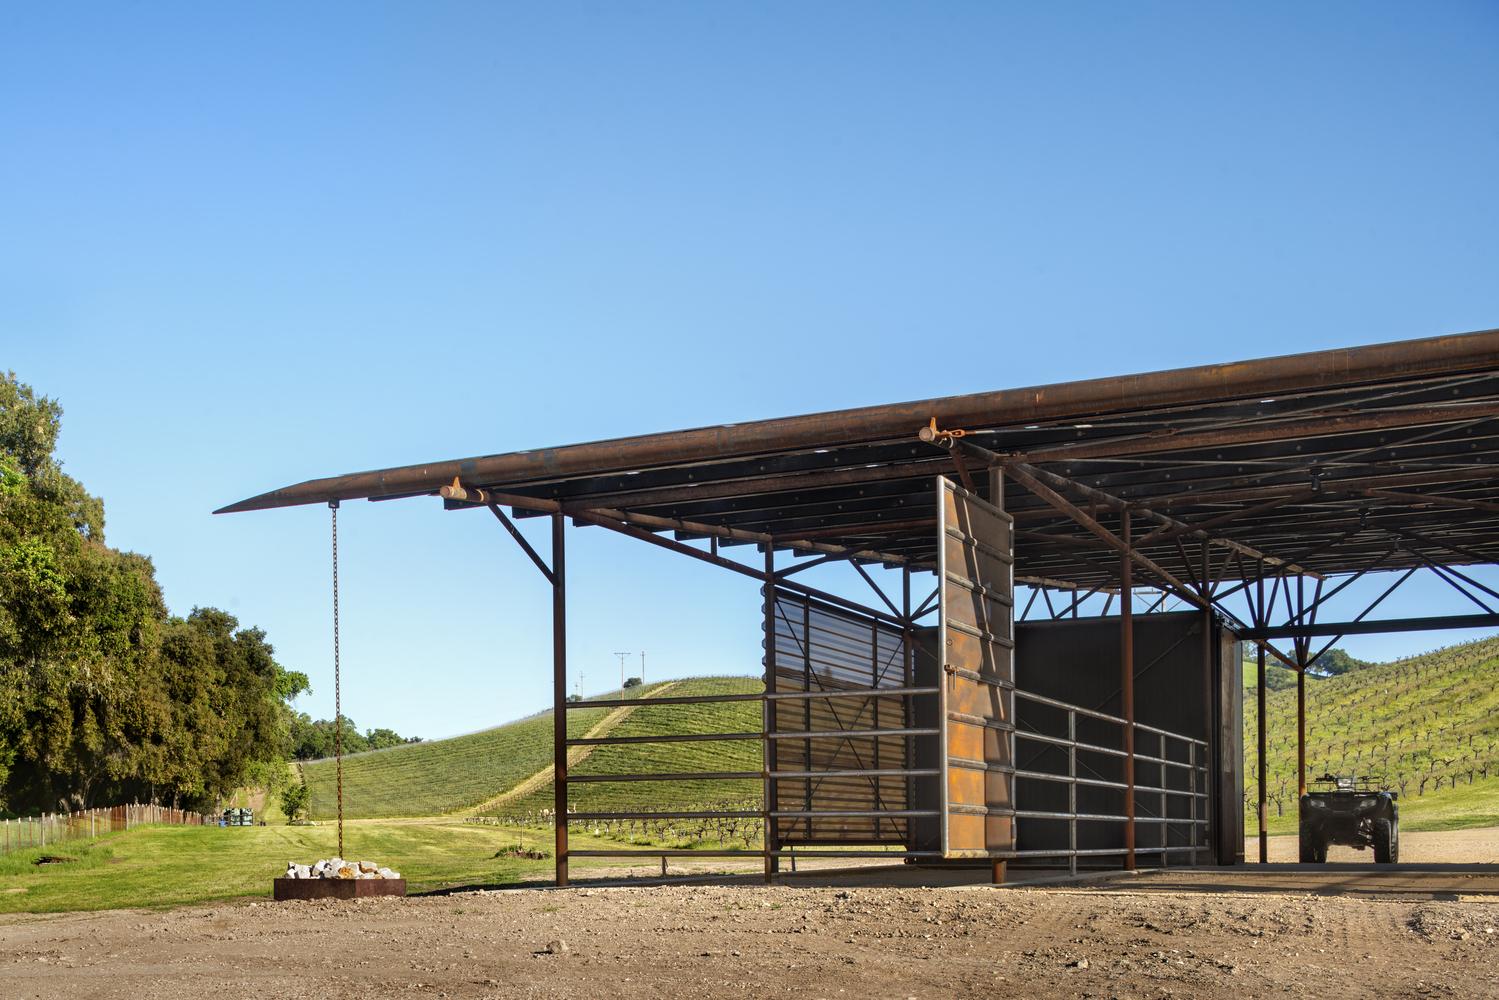 Consejos para aprovechar el agua de lluvia en proyectos de arquitectura,Saxum Vineyard Equipment Barn / Clayton & Little. Image © Casey Dunn